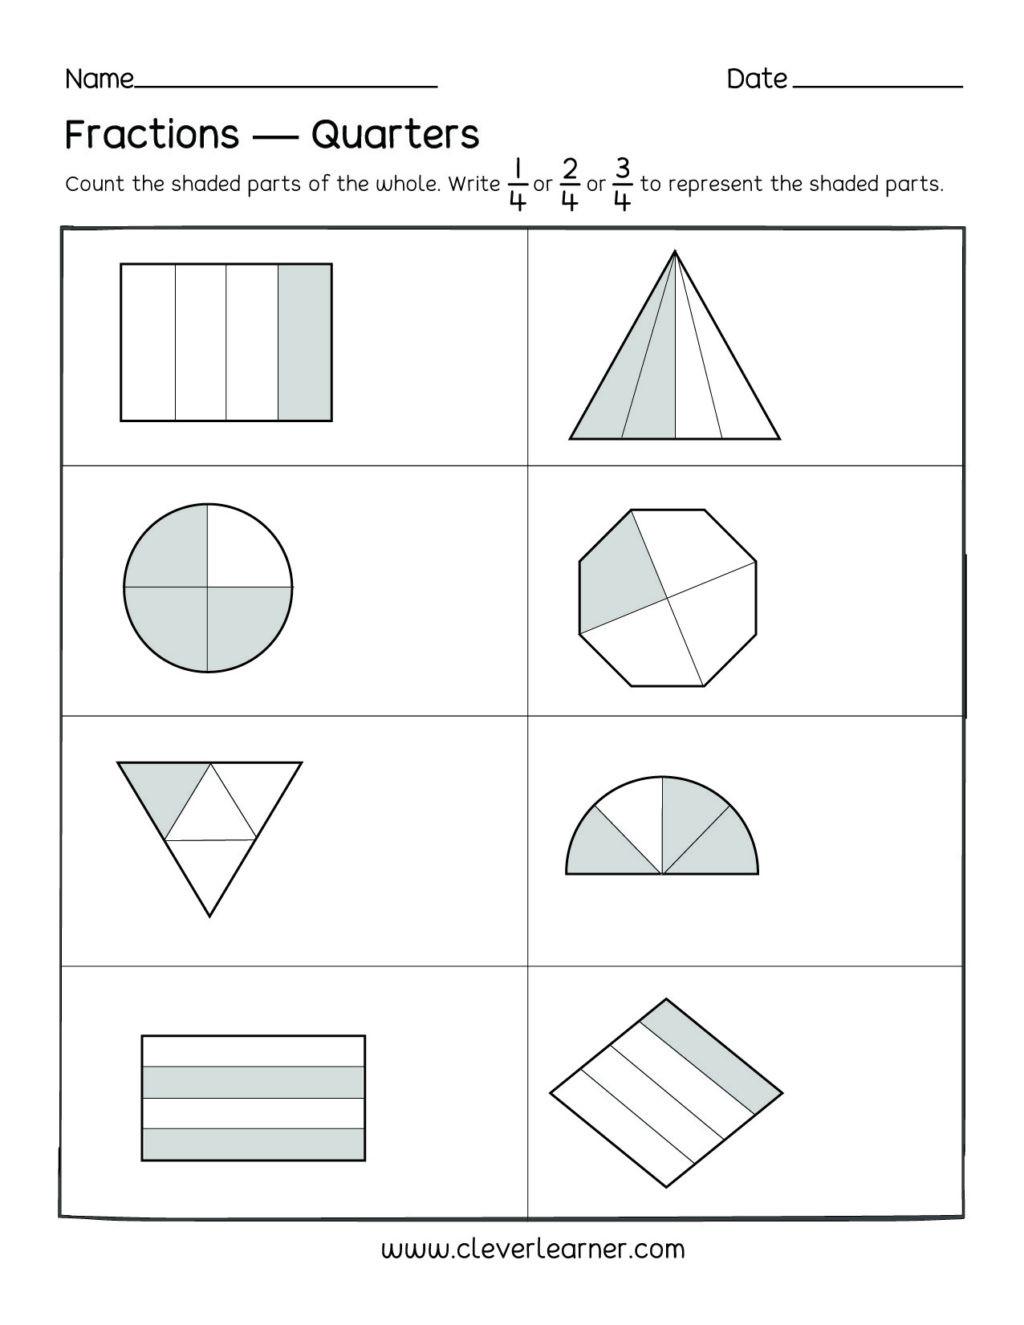 2nd Grade Fractions Worksheet